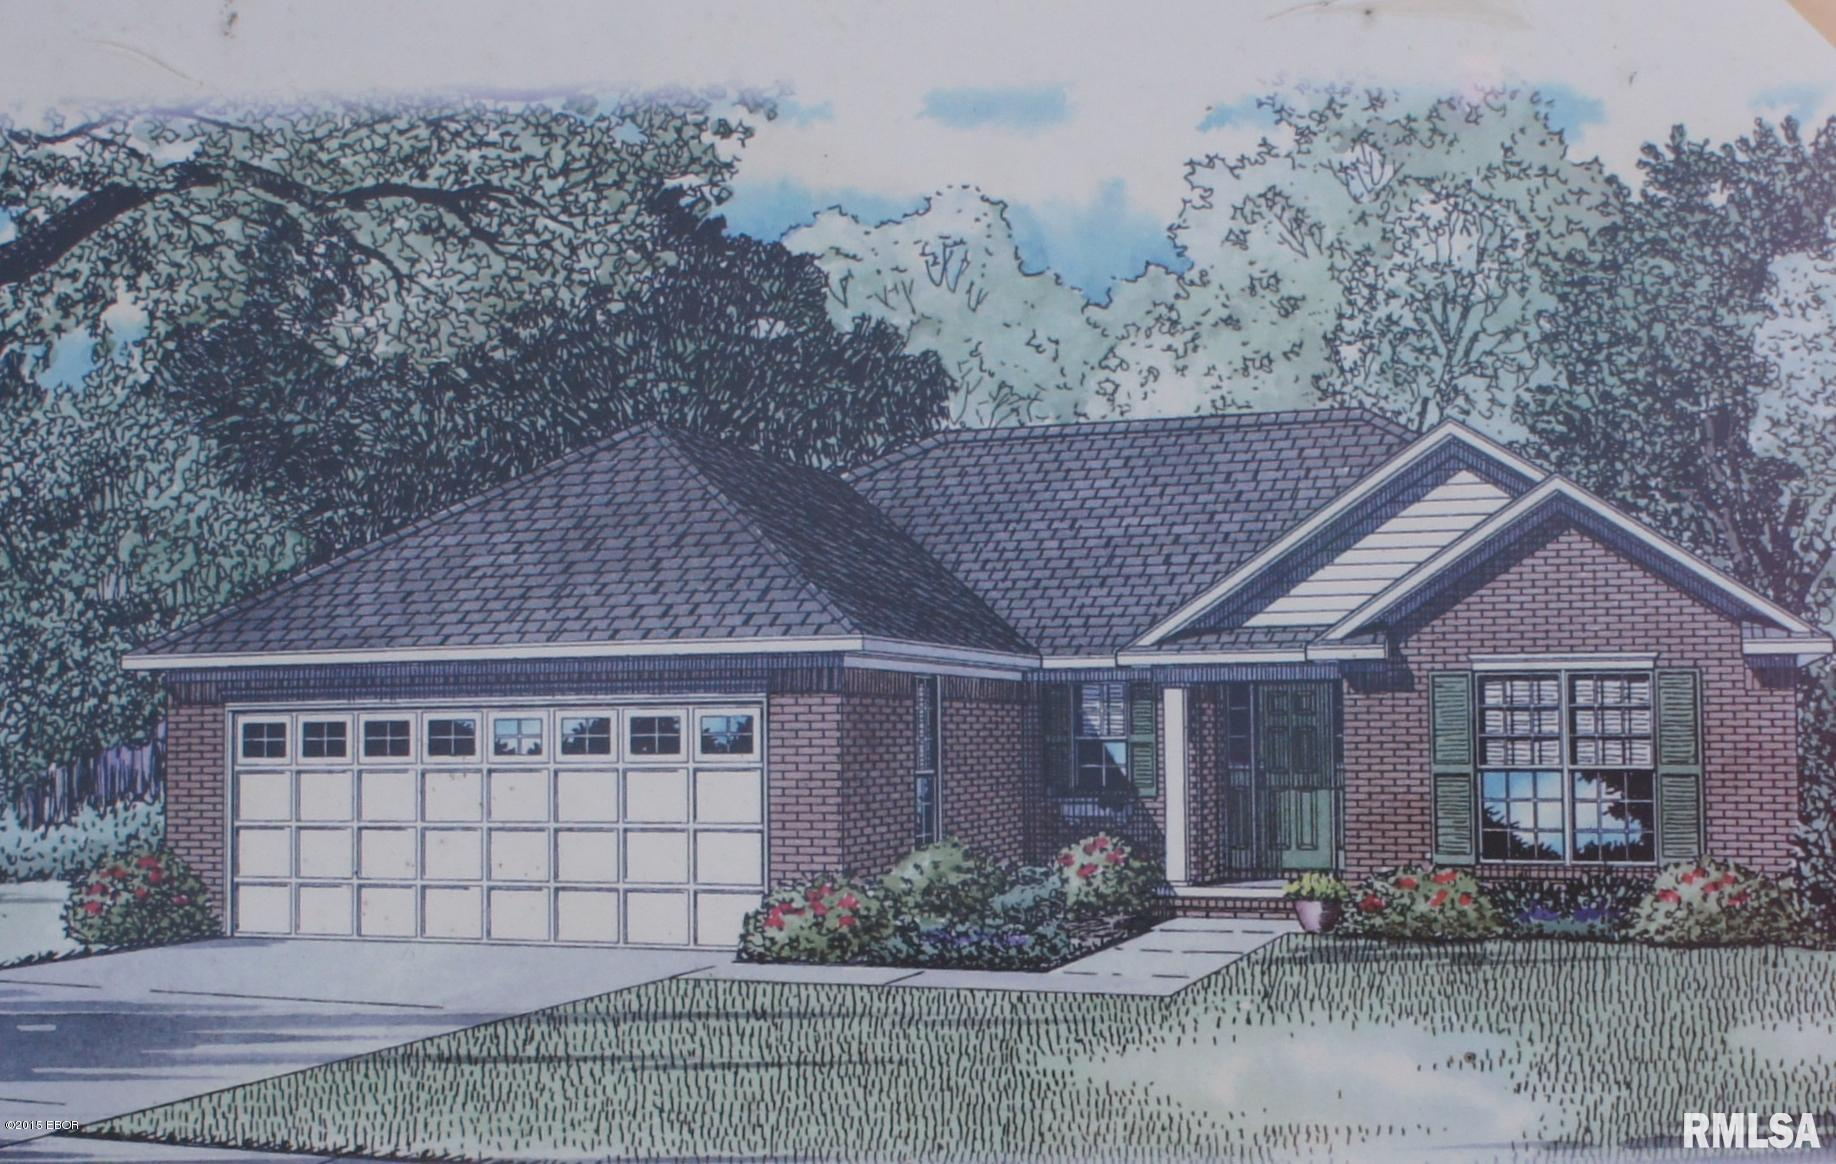 654 QUAIL Property Photo - Metropolis, IL real estate listing